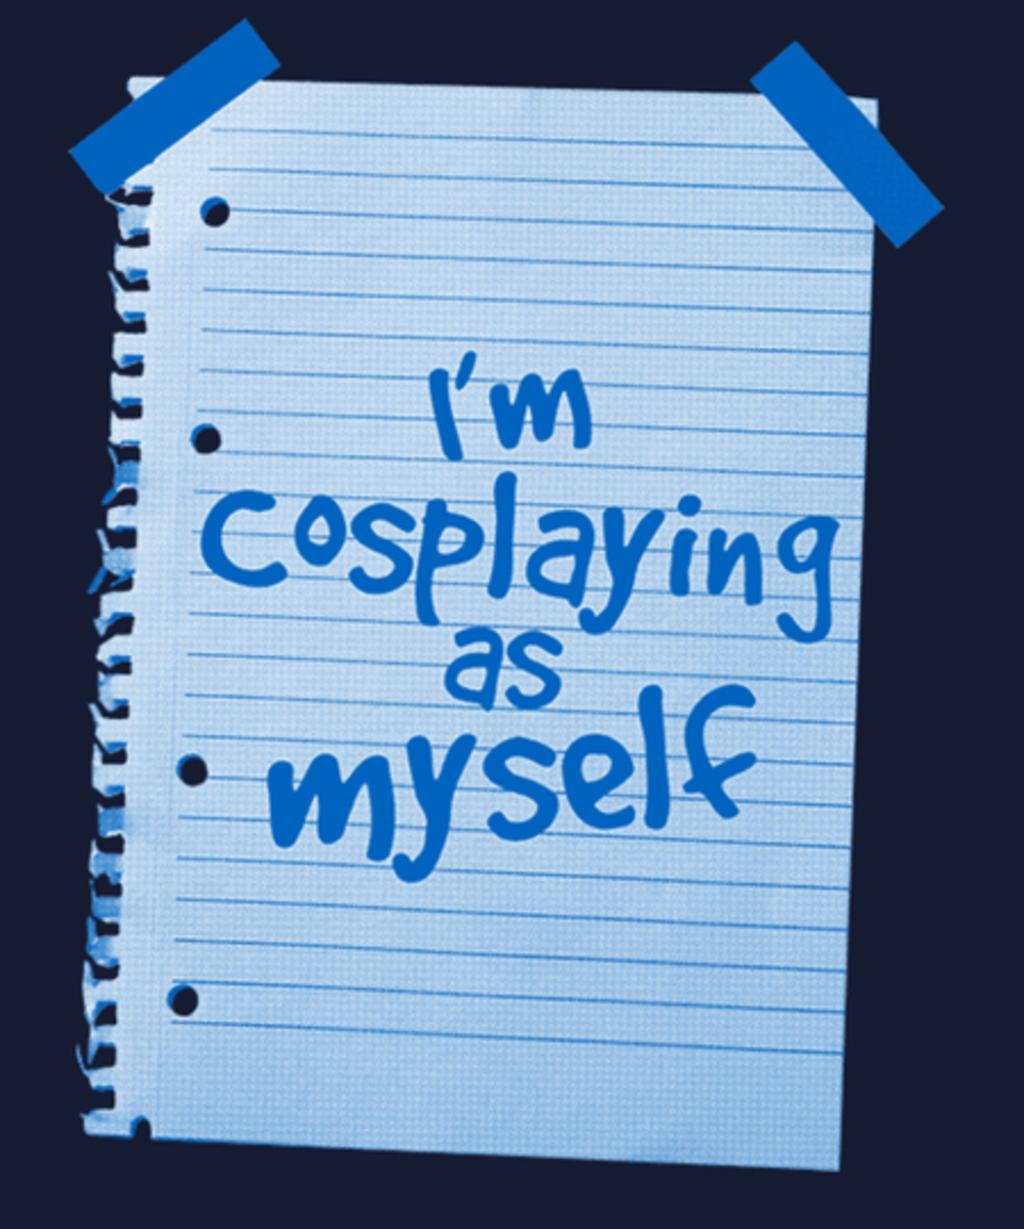 Qwertee: Alternative cosplay